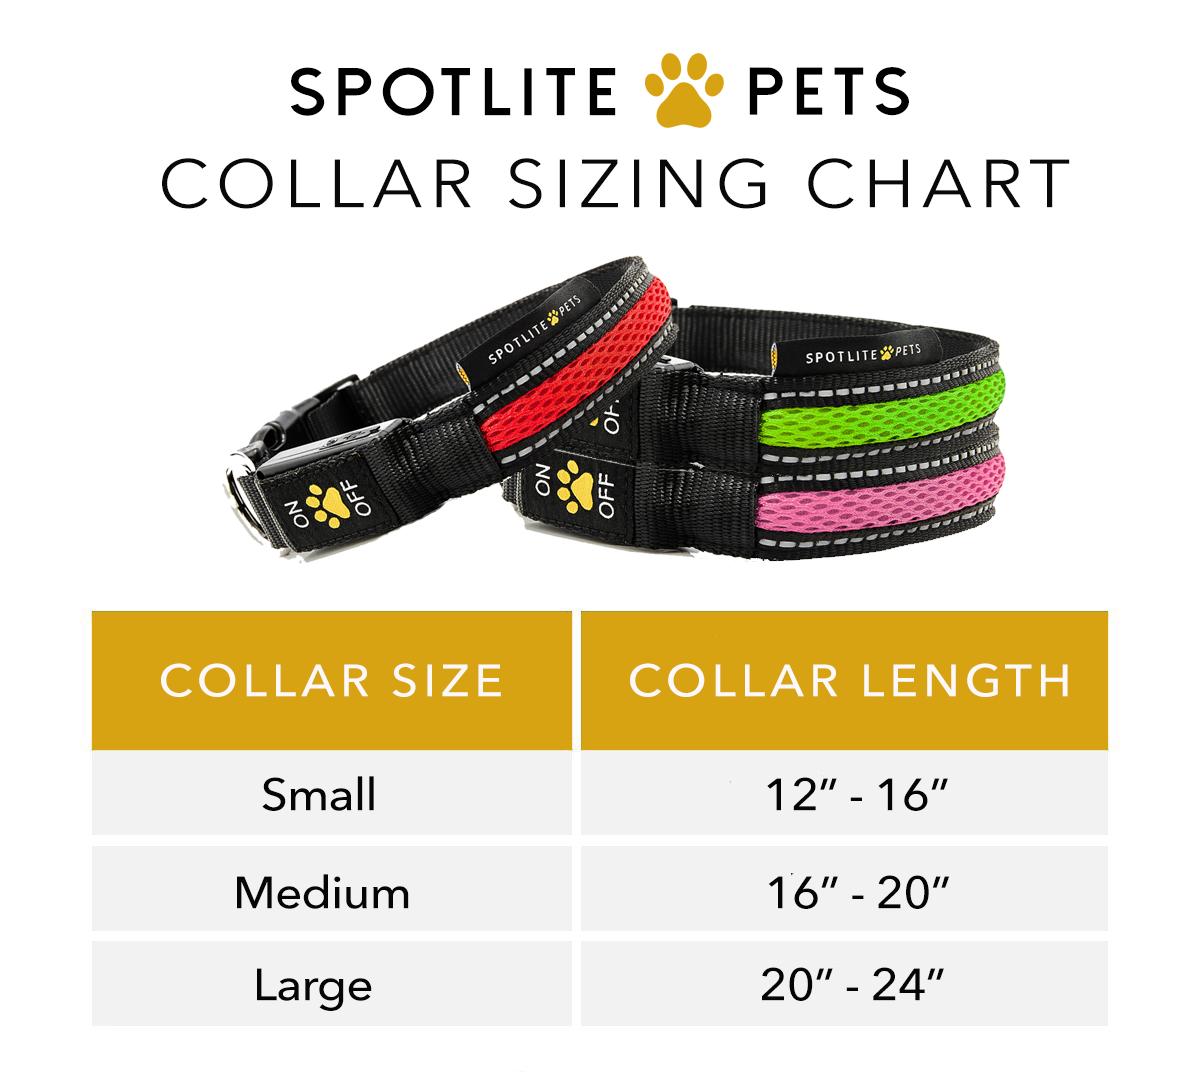 Spotlite Collar Size Chart.png